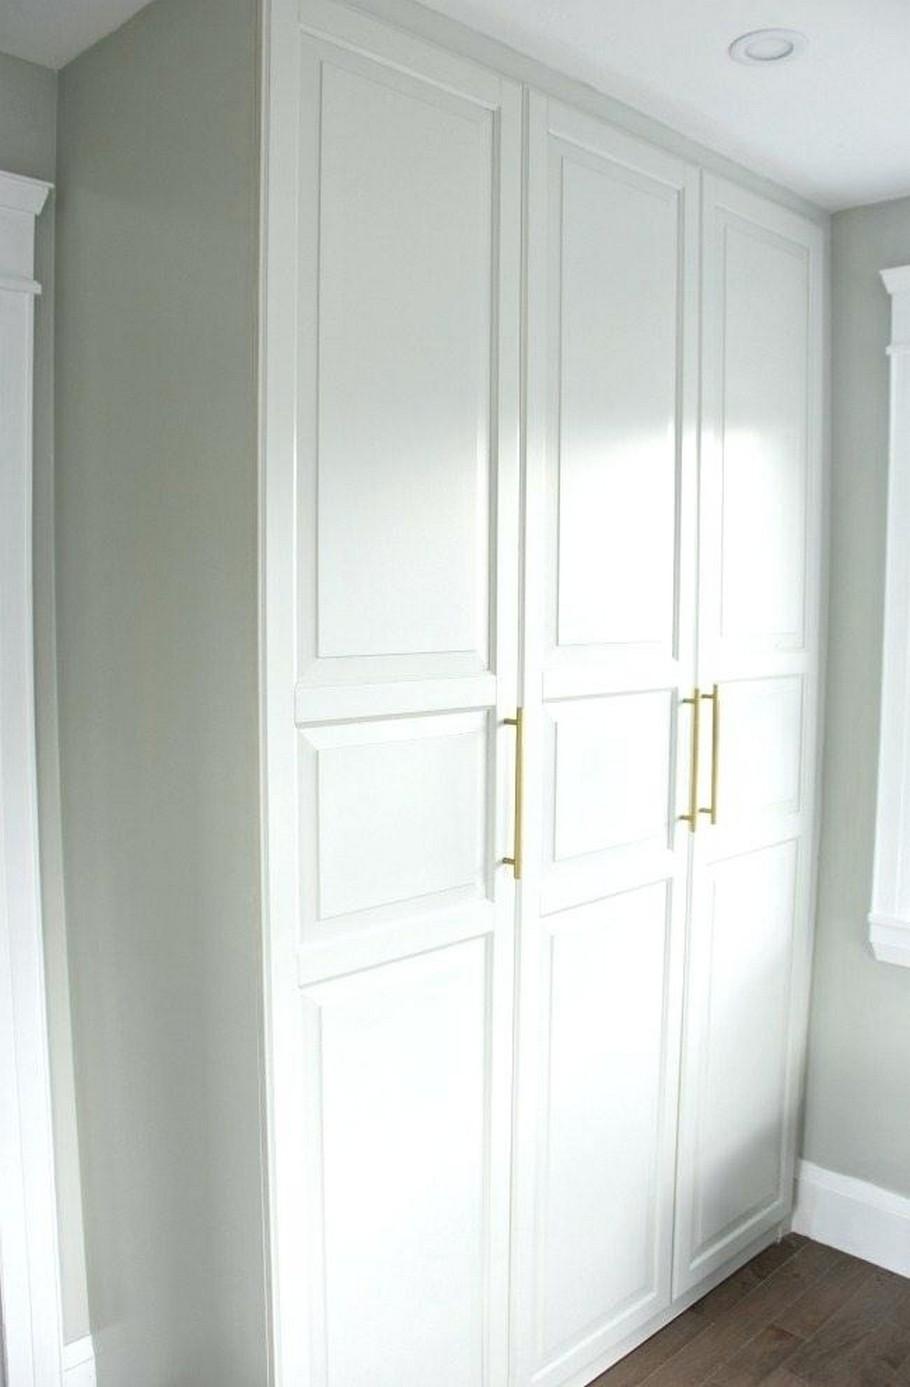 Marvelous Inspiration of Closet Construction Concept